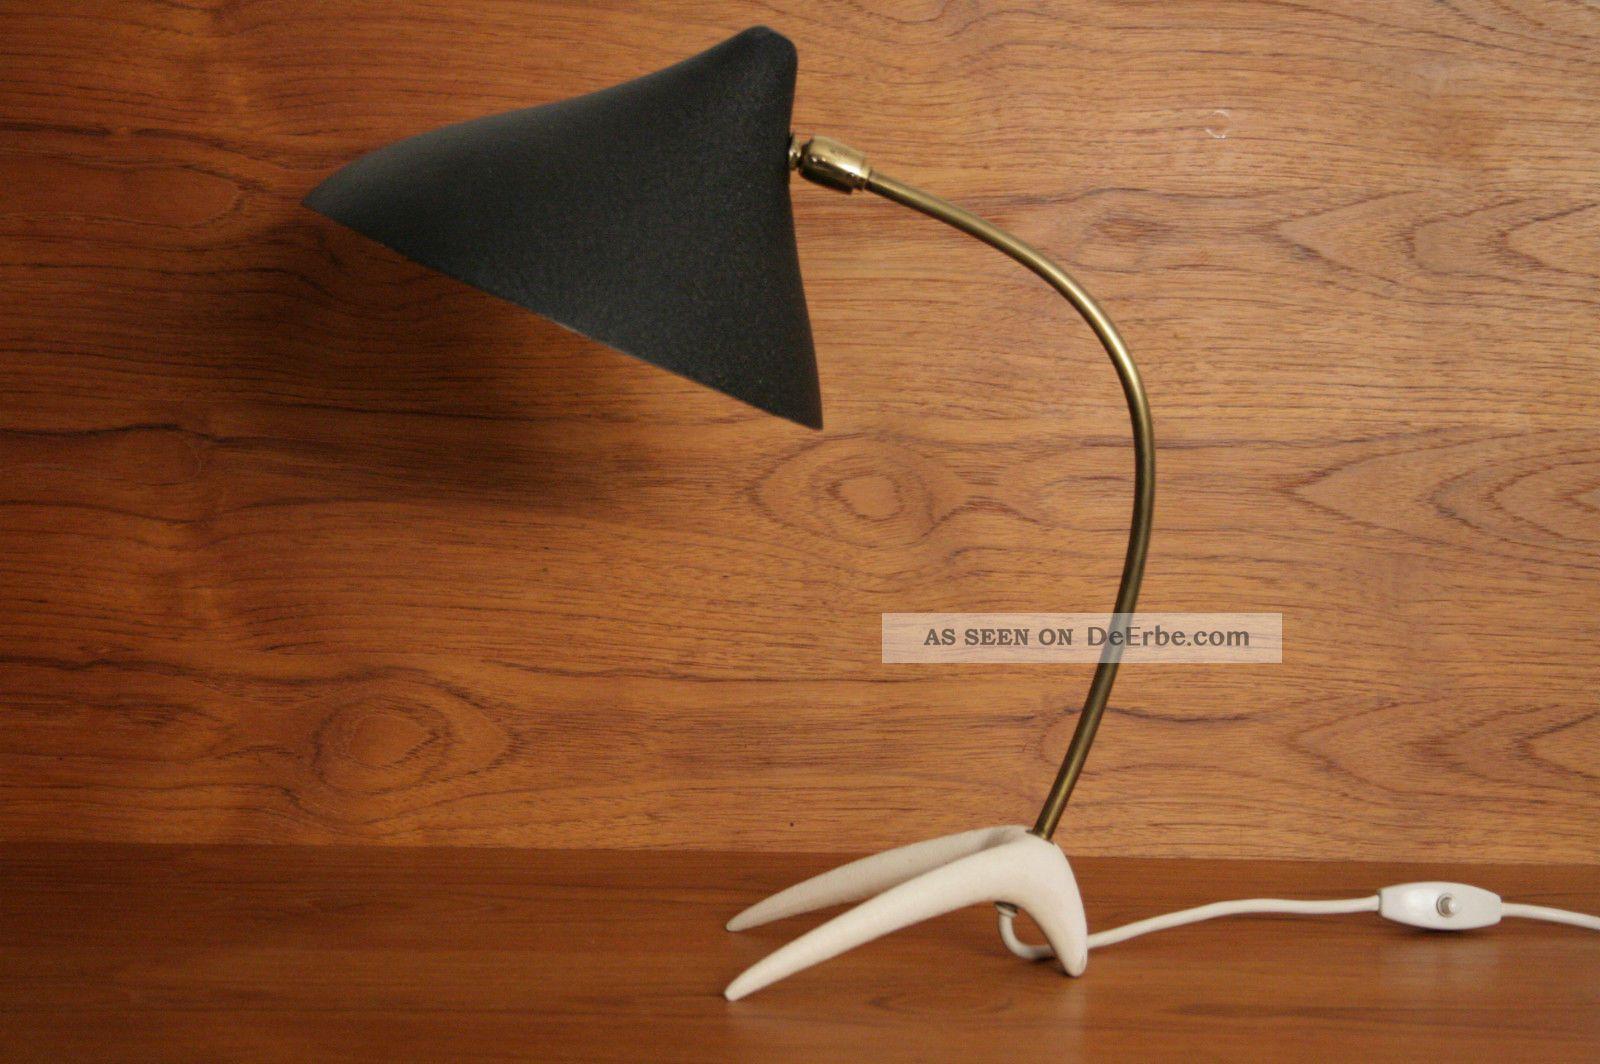 tischlampe louis kalff lampe 50er 60er jahre 50s lamp mid century kr henfuss. Black Bedroom Furniture Sets. Home Design Ideas